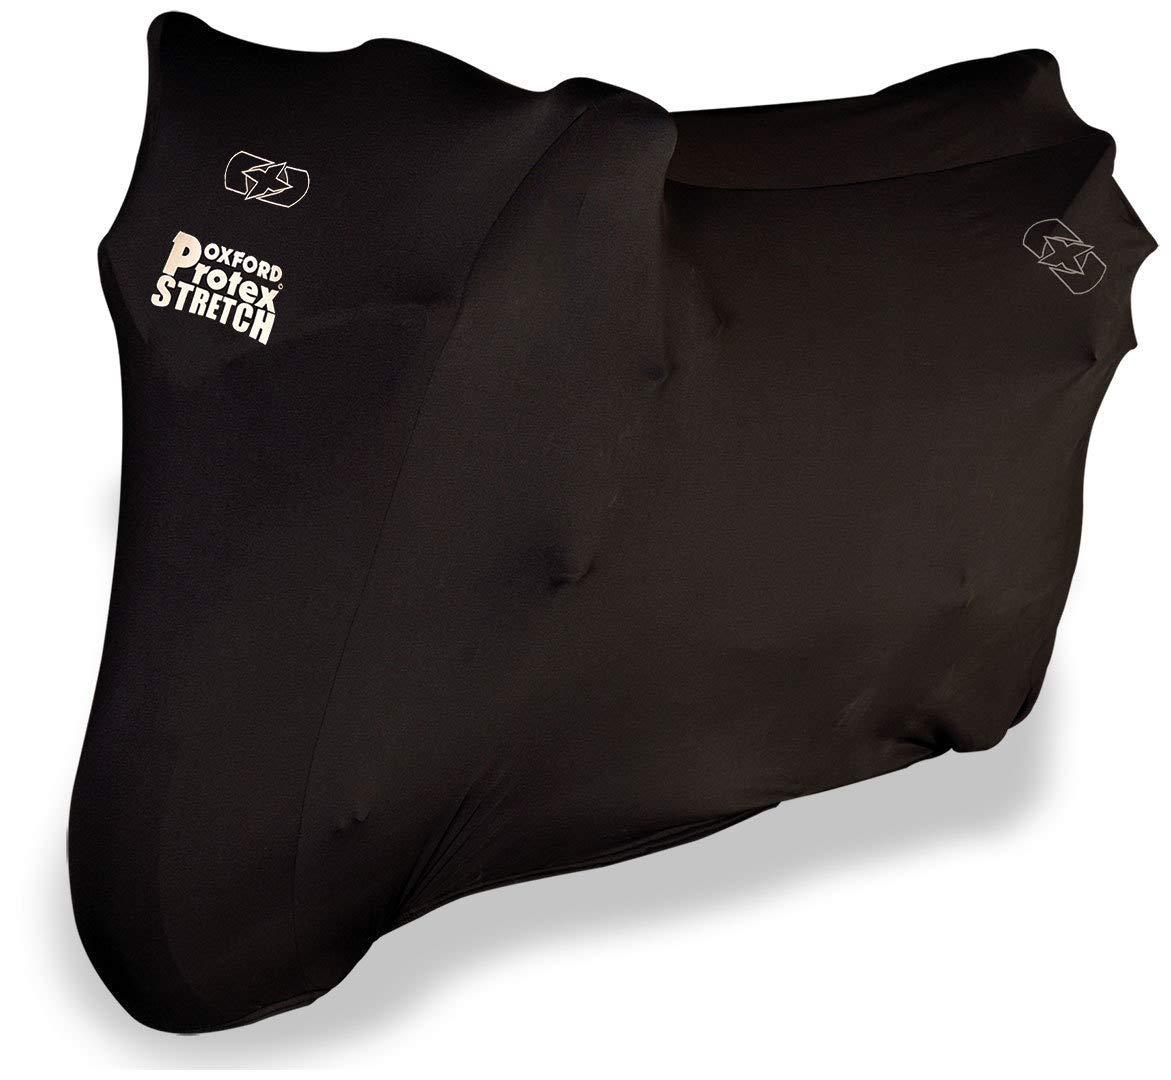 TRIUMPH THRUXTON 1200 R Oxford Protex Stretch Breathable Dust Cover Bike Black